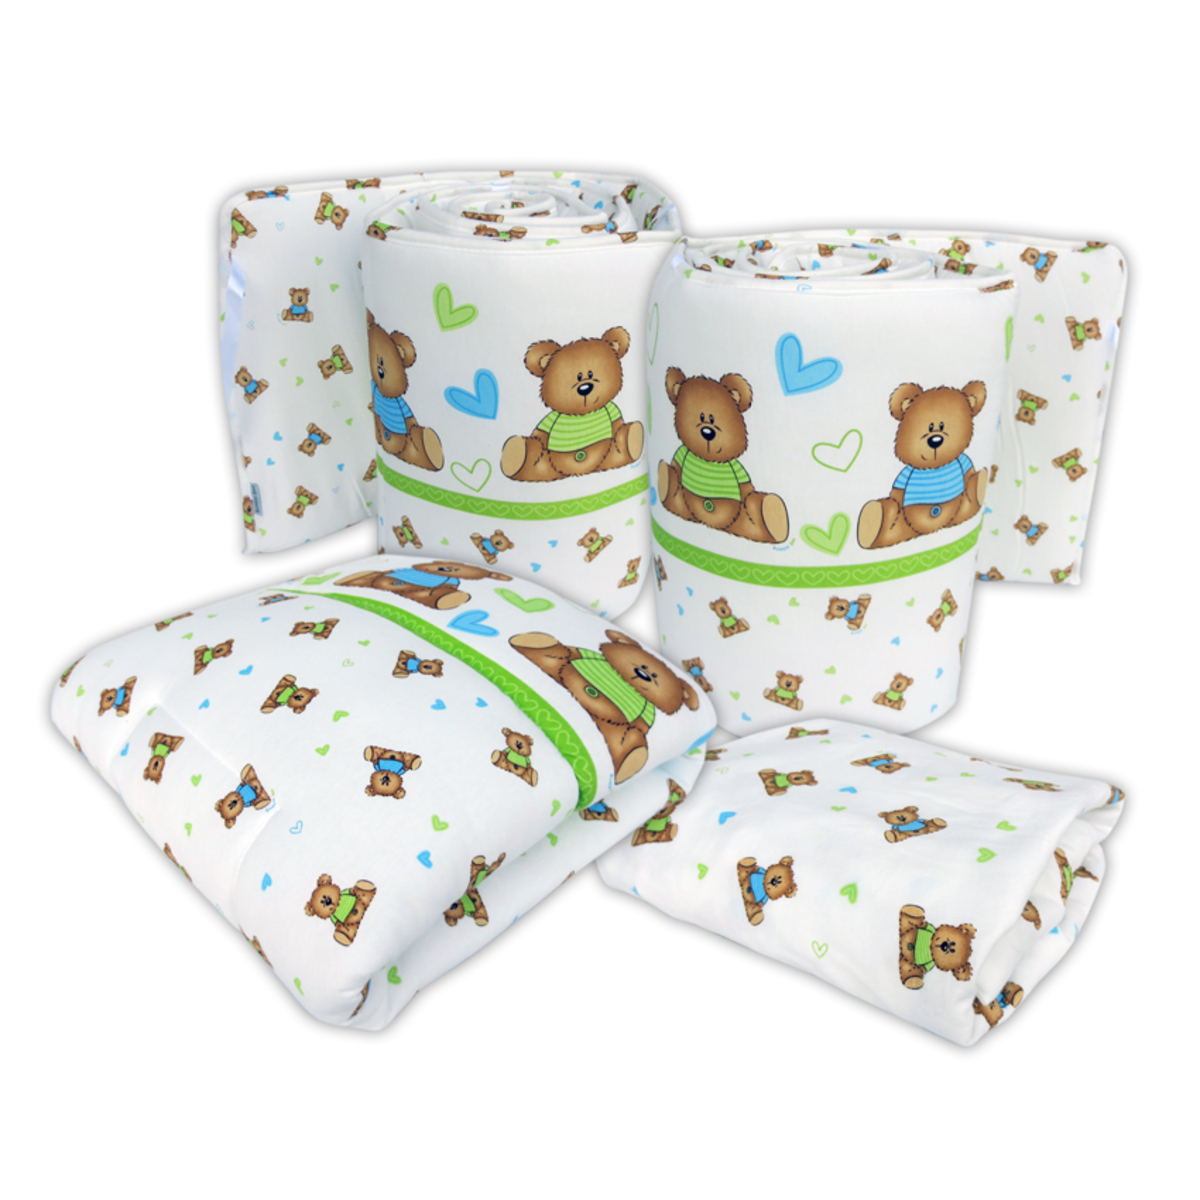 Bumble Bee Baby Bedding Set - 4pc Crib Set | Go Shop